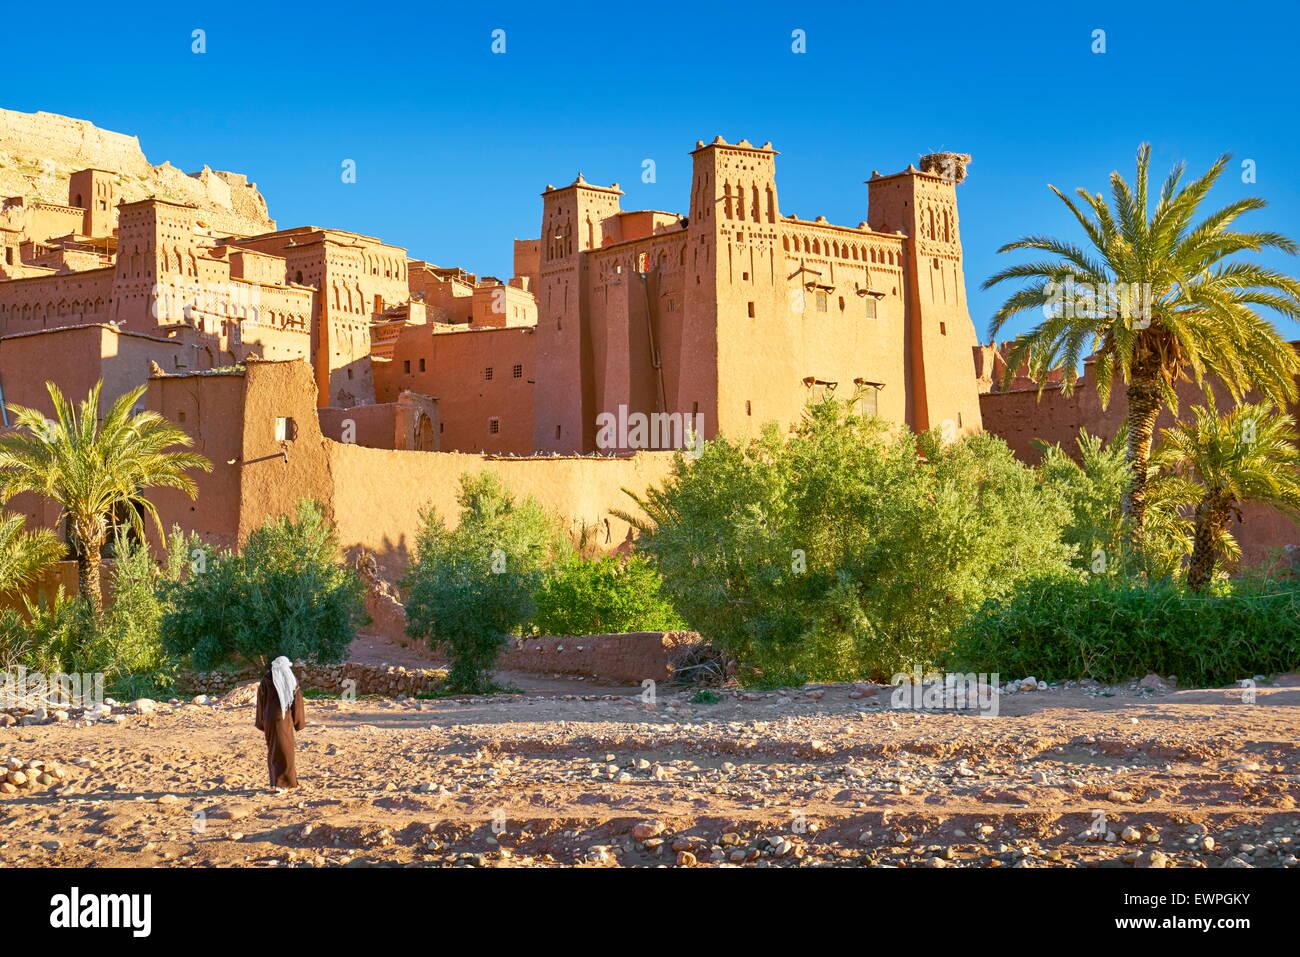 Ait Benhaddou forteresse près de Ouarzazate, Maroc Photo Stock